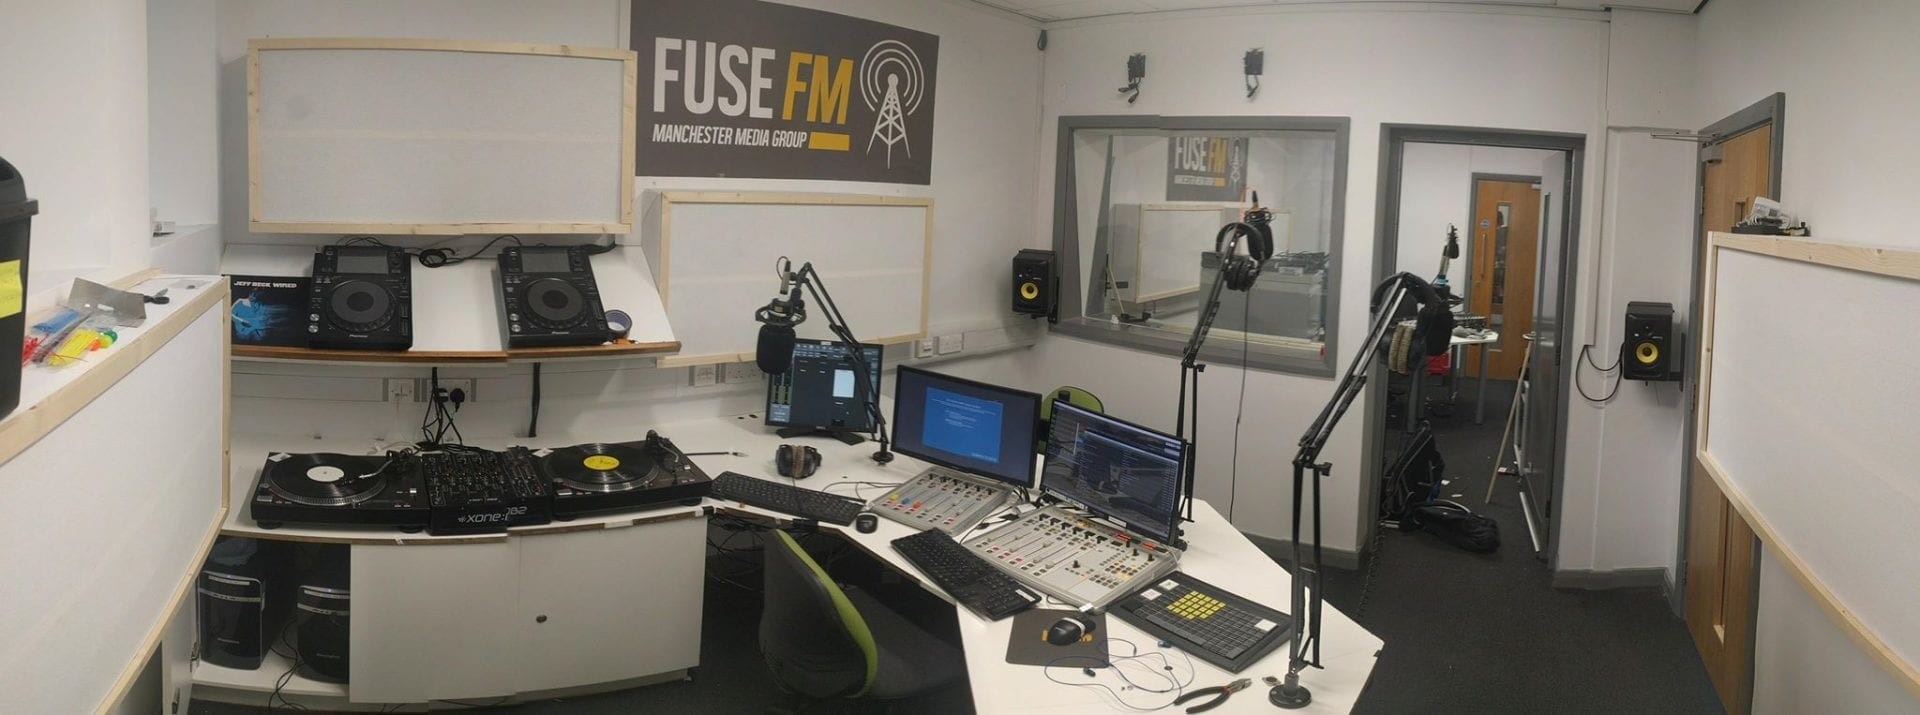 Fuse studio - Manchester Fuse FM